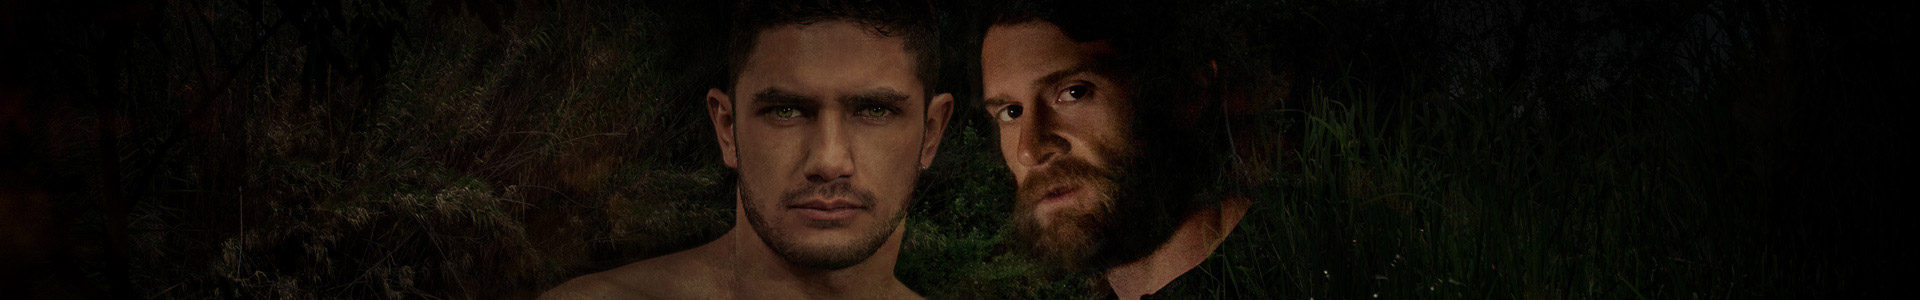 Men Series: Gay of Thrones